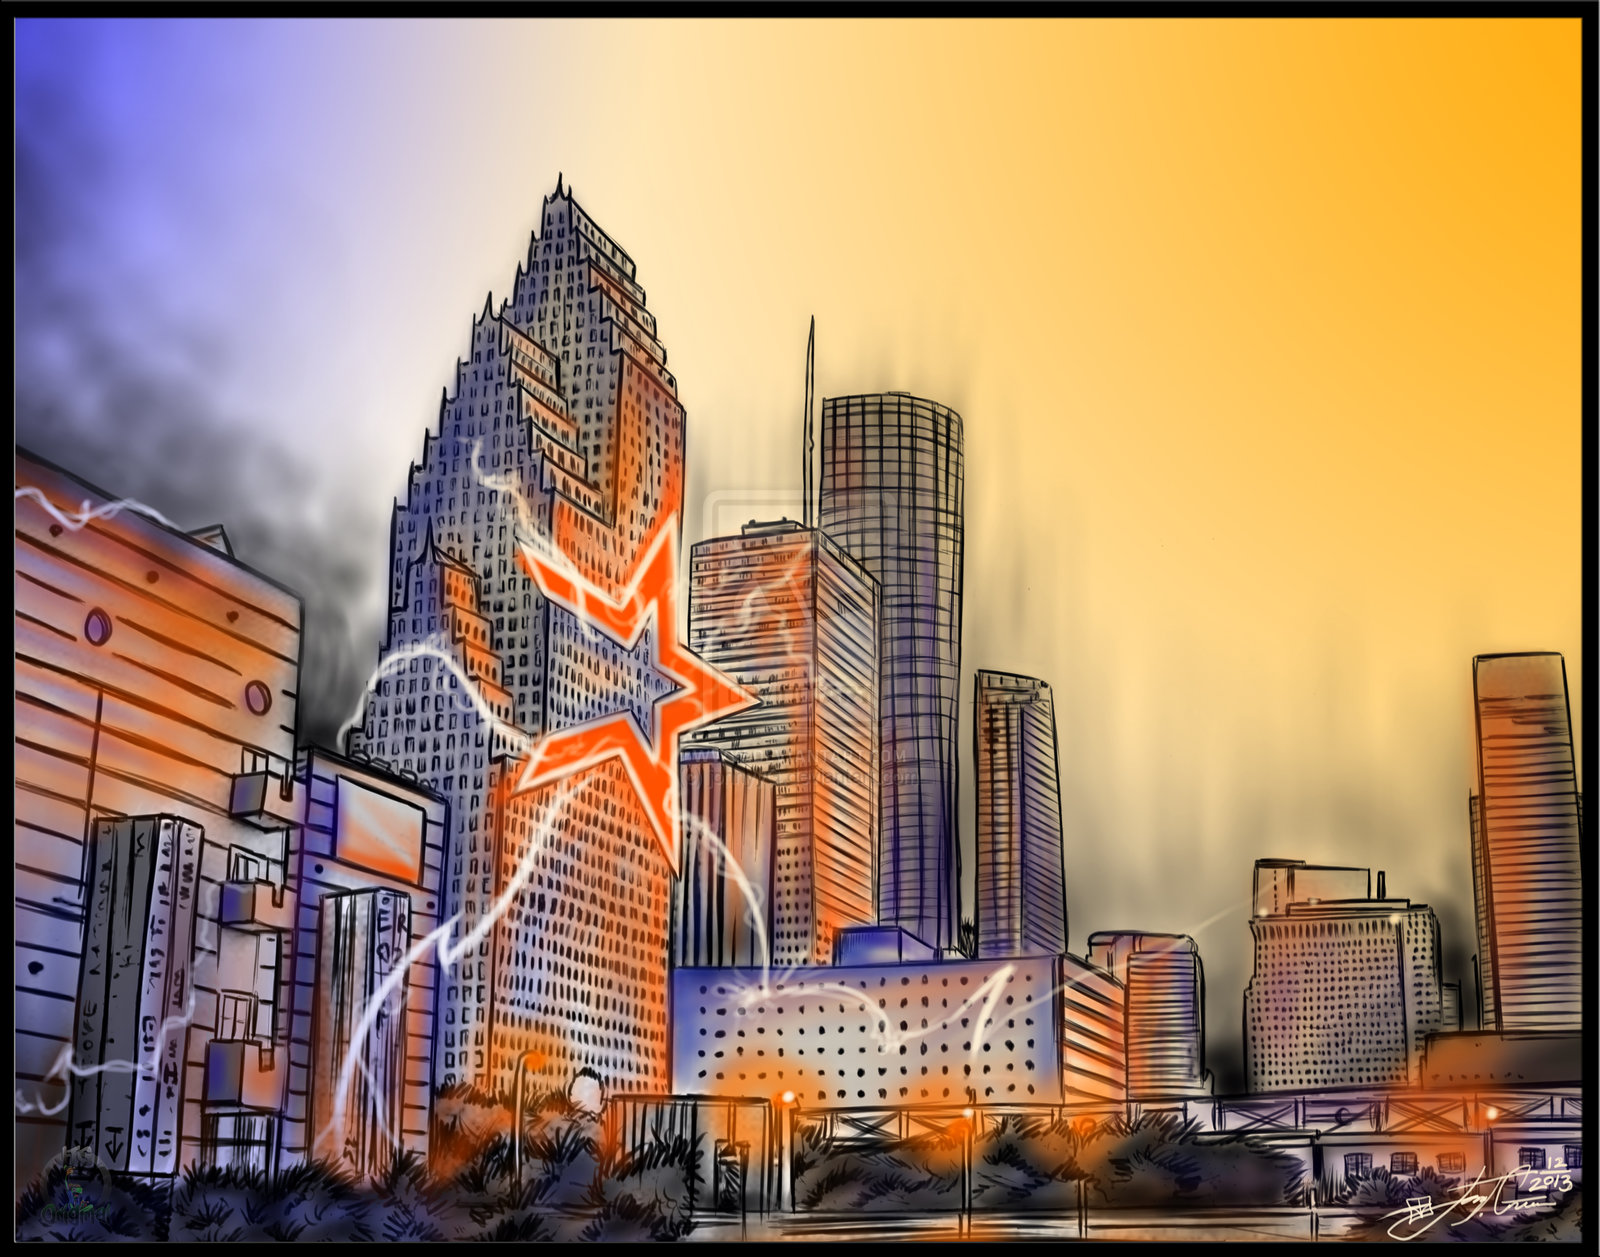 [45+] Houston Astros iPhone Wallpaper on WallpaperSafari